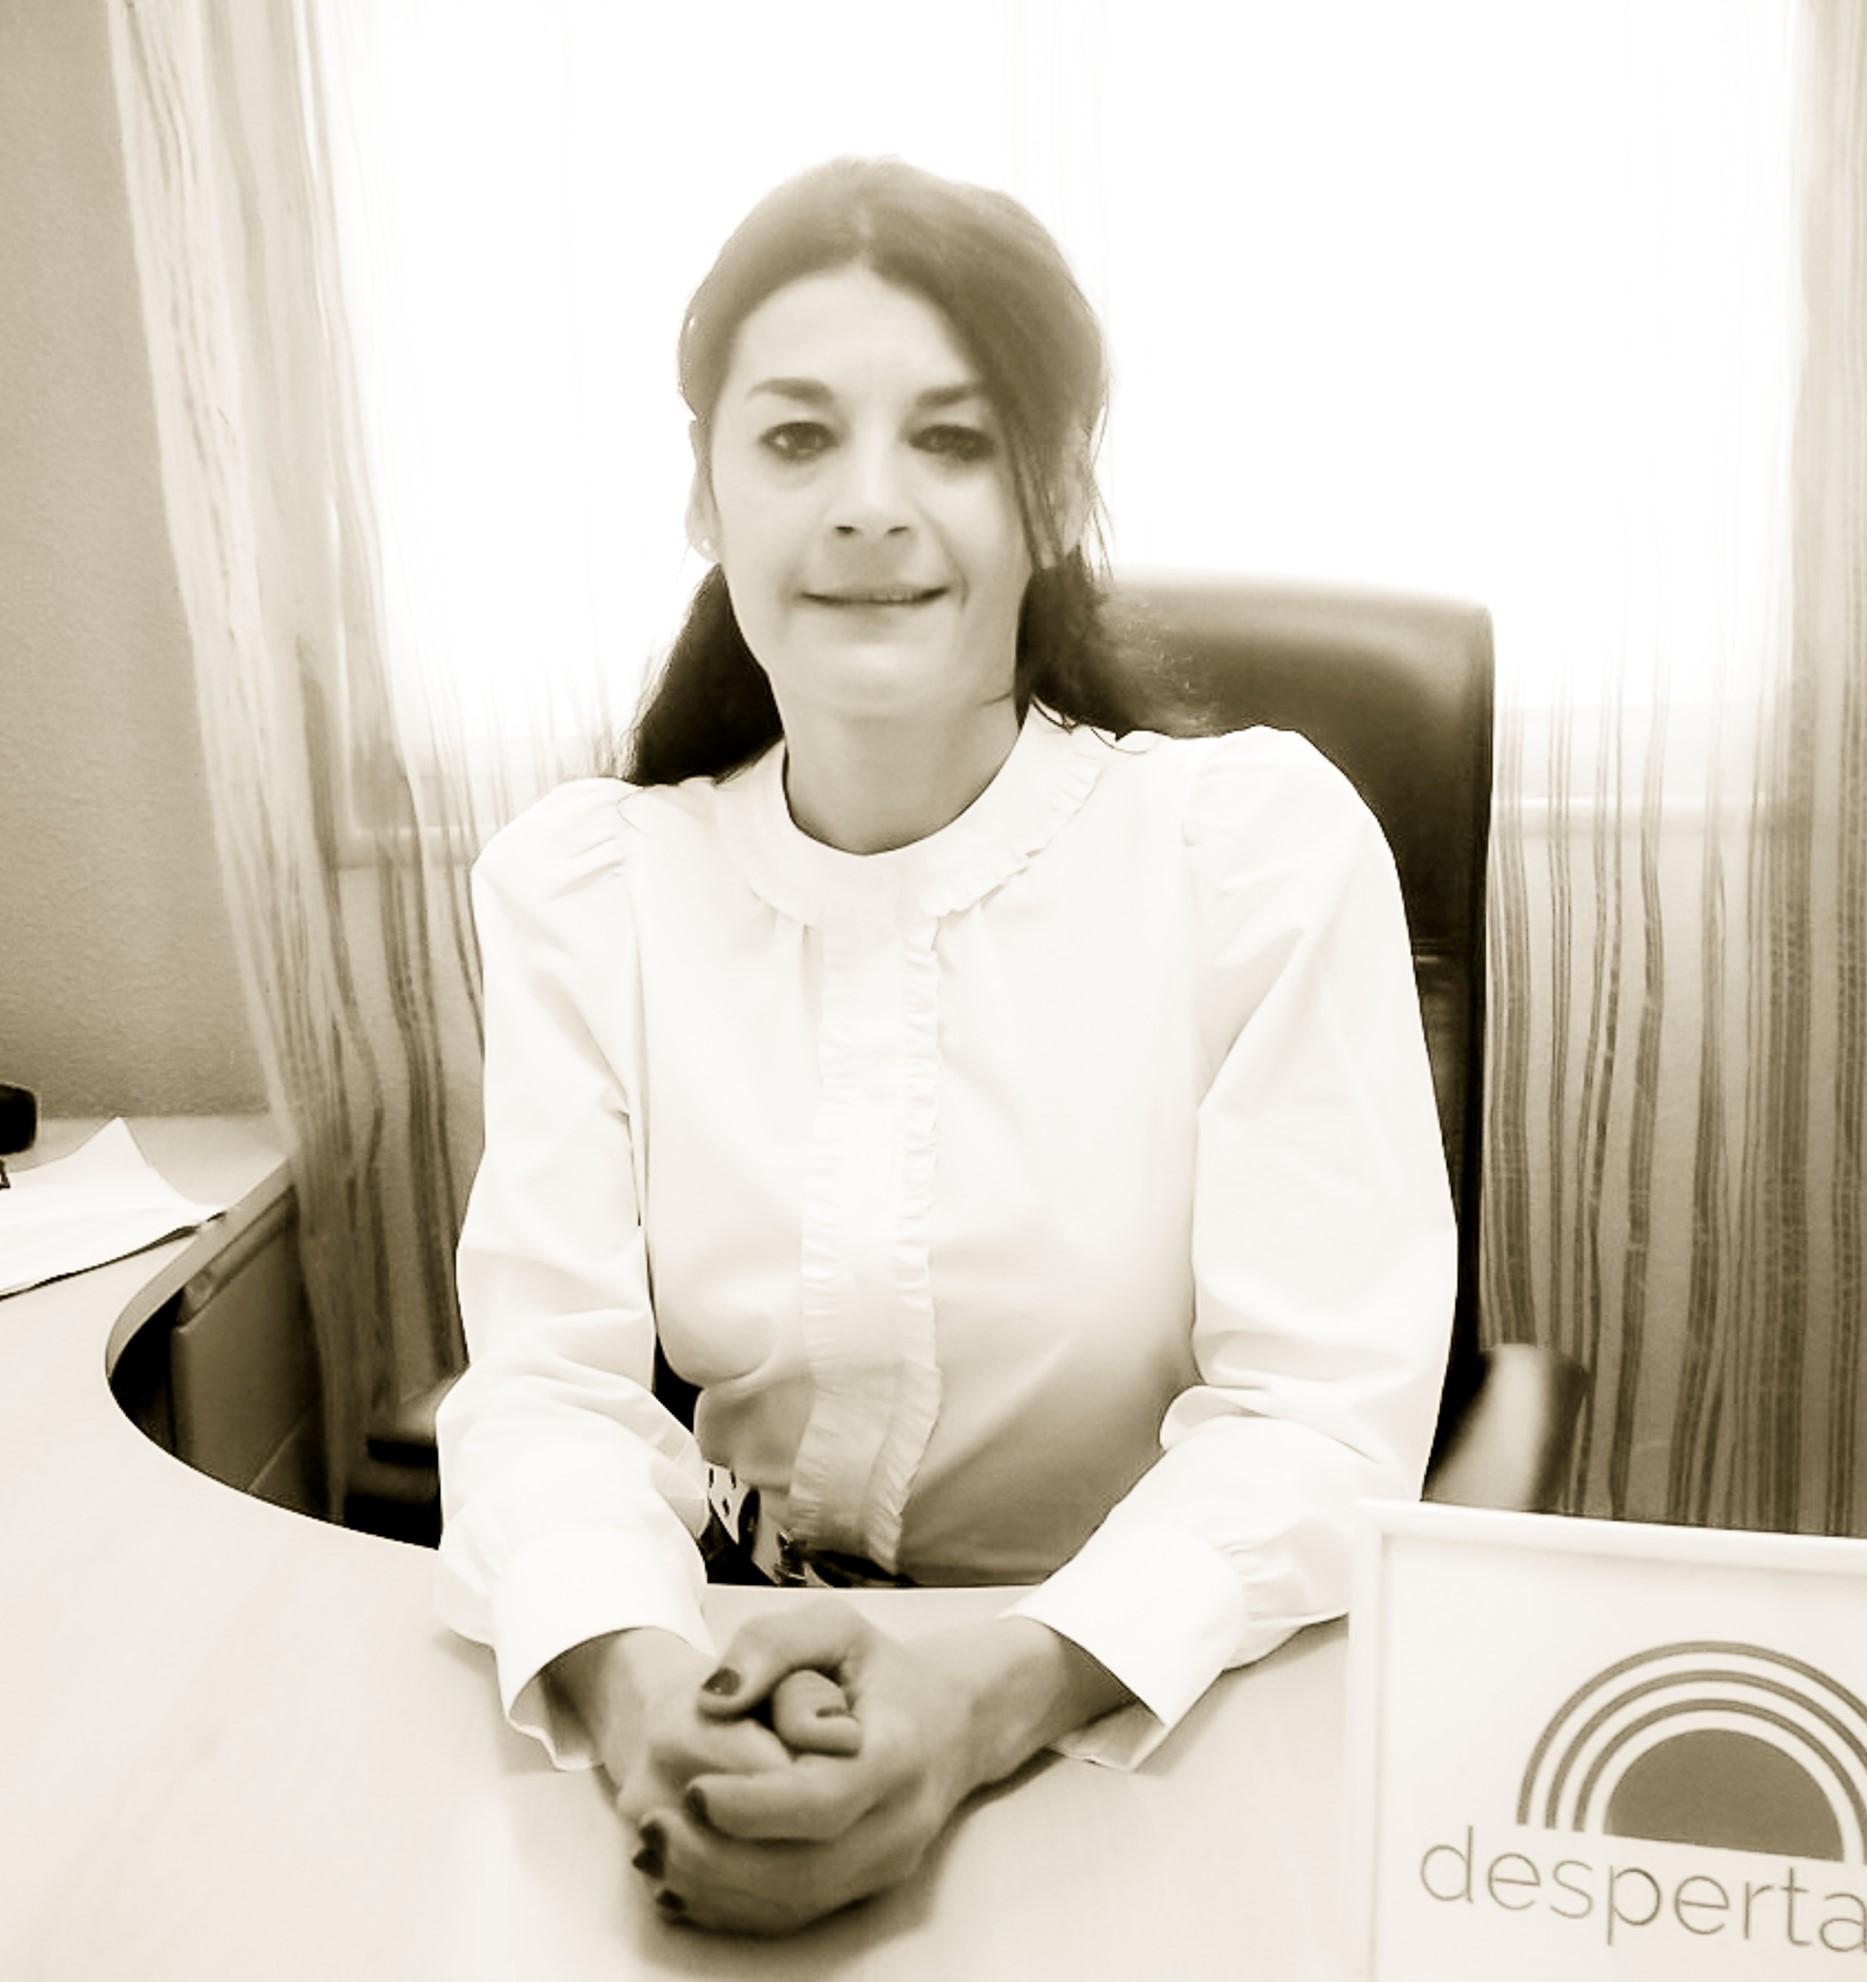 Consulta Psicológica Getafe - Psicólogo Getafe - Terapia Psicológica Getafe